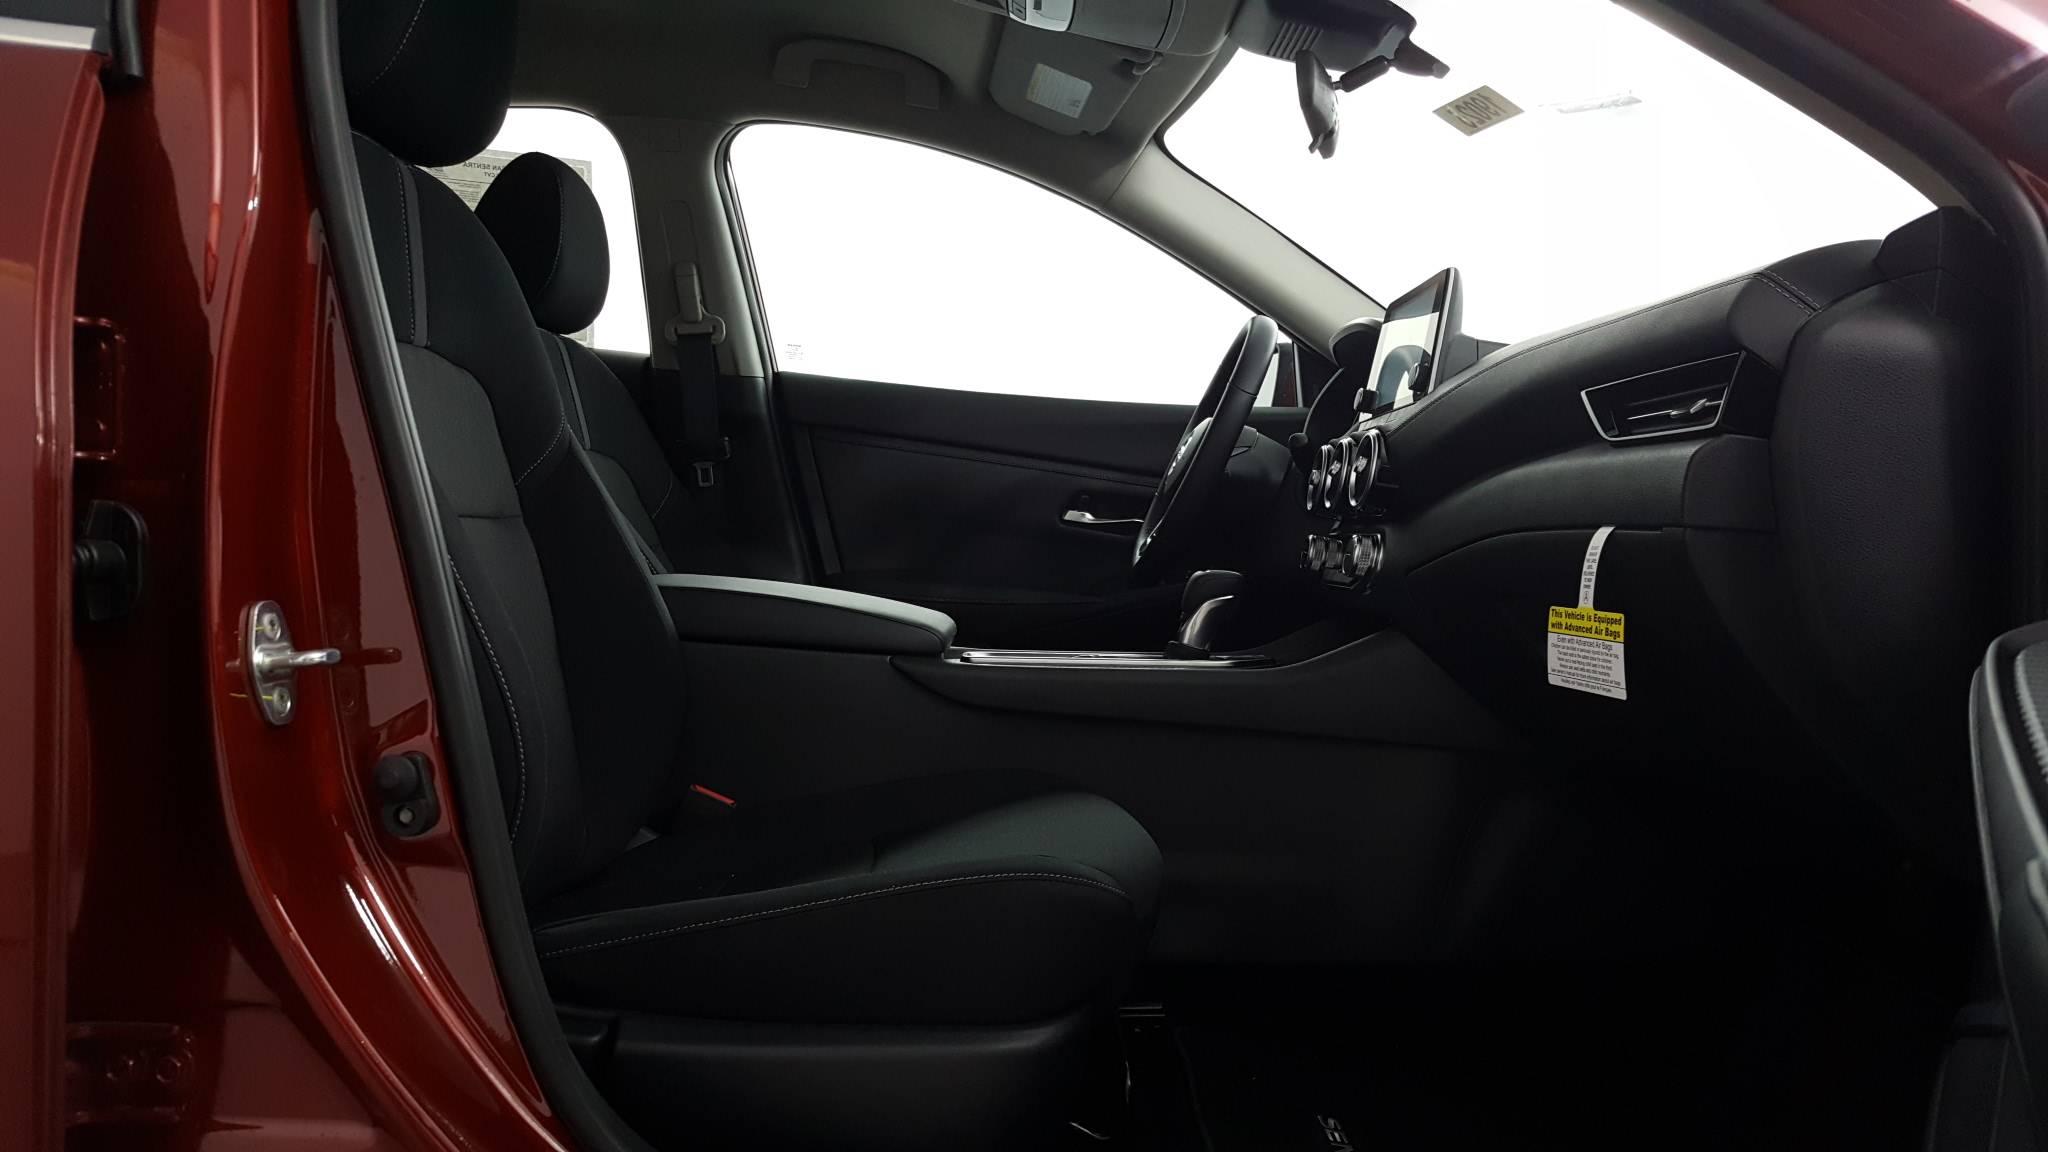 2020 Nissan Sentra 4dr Car